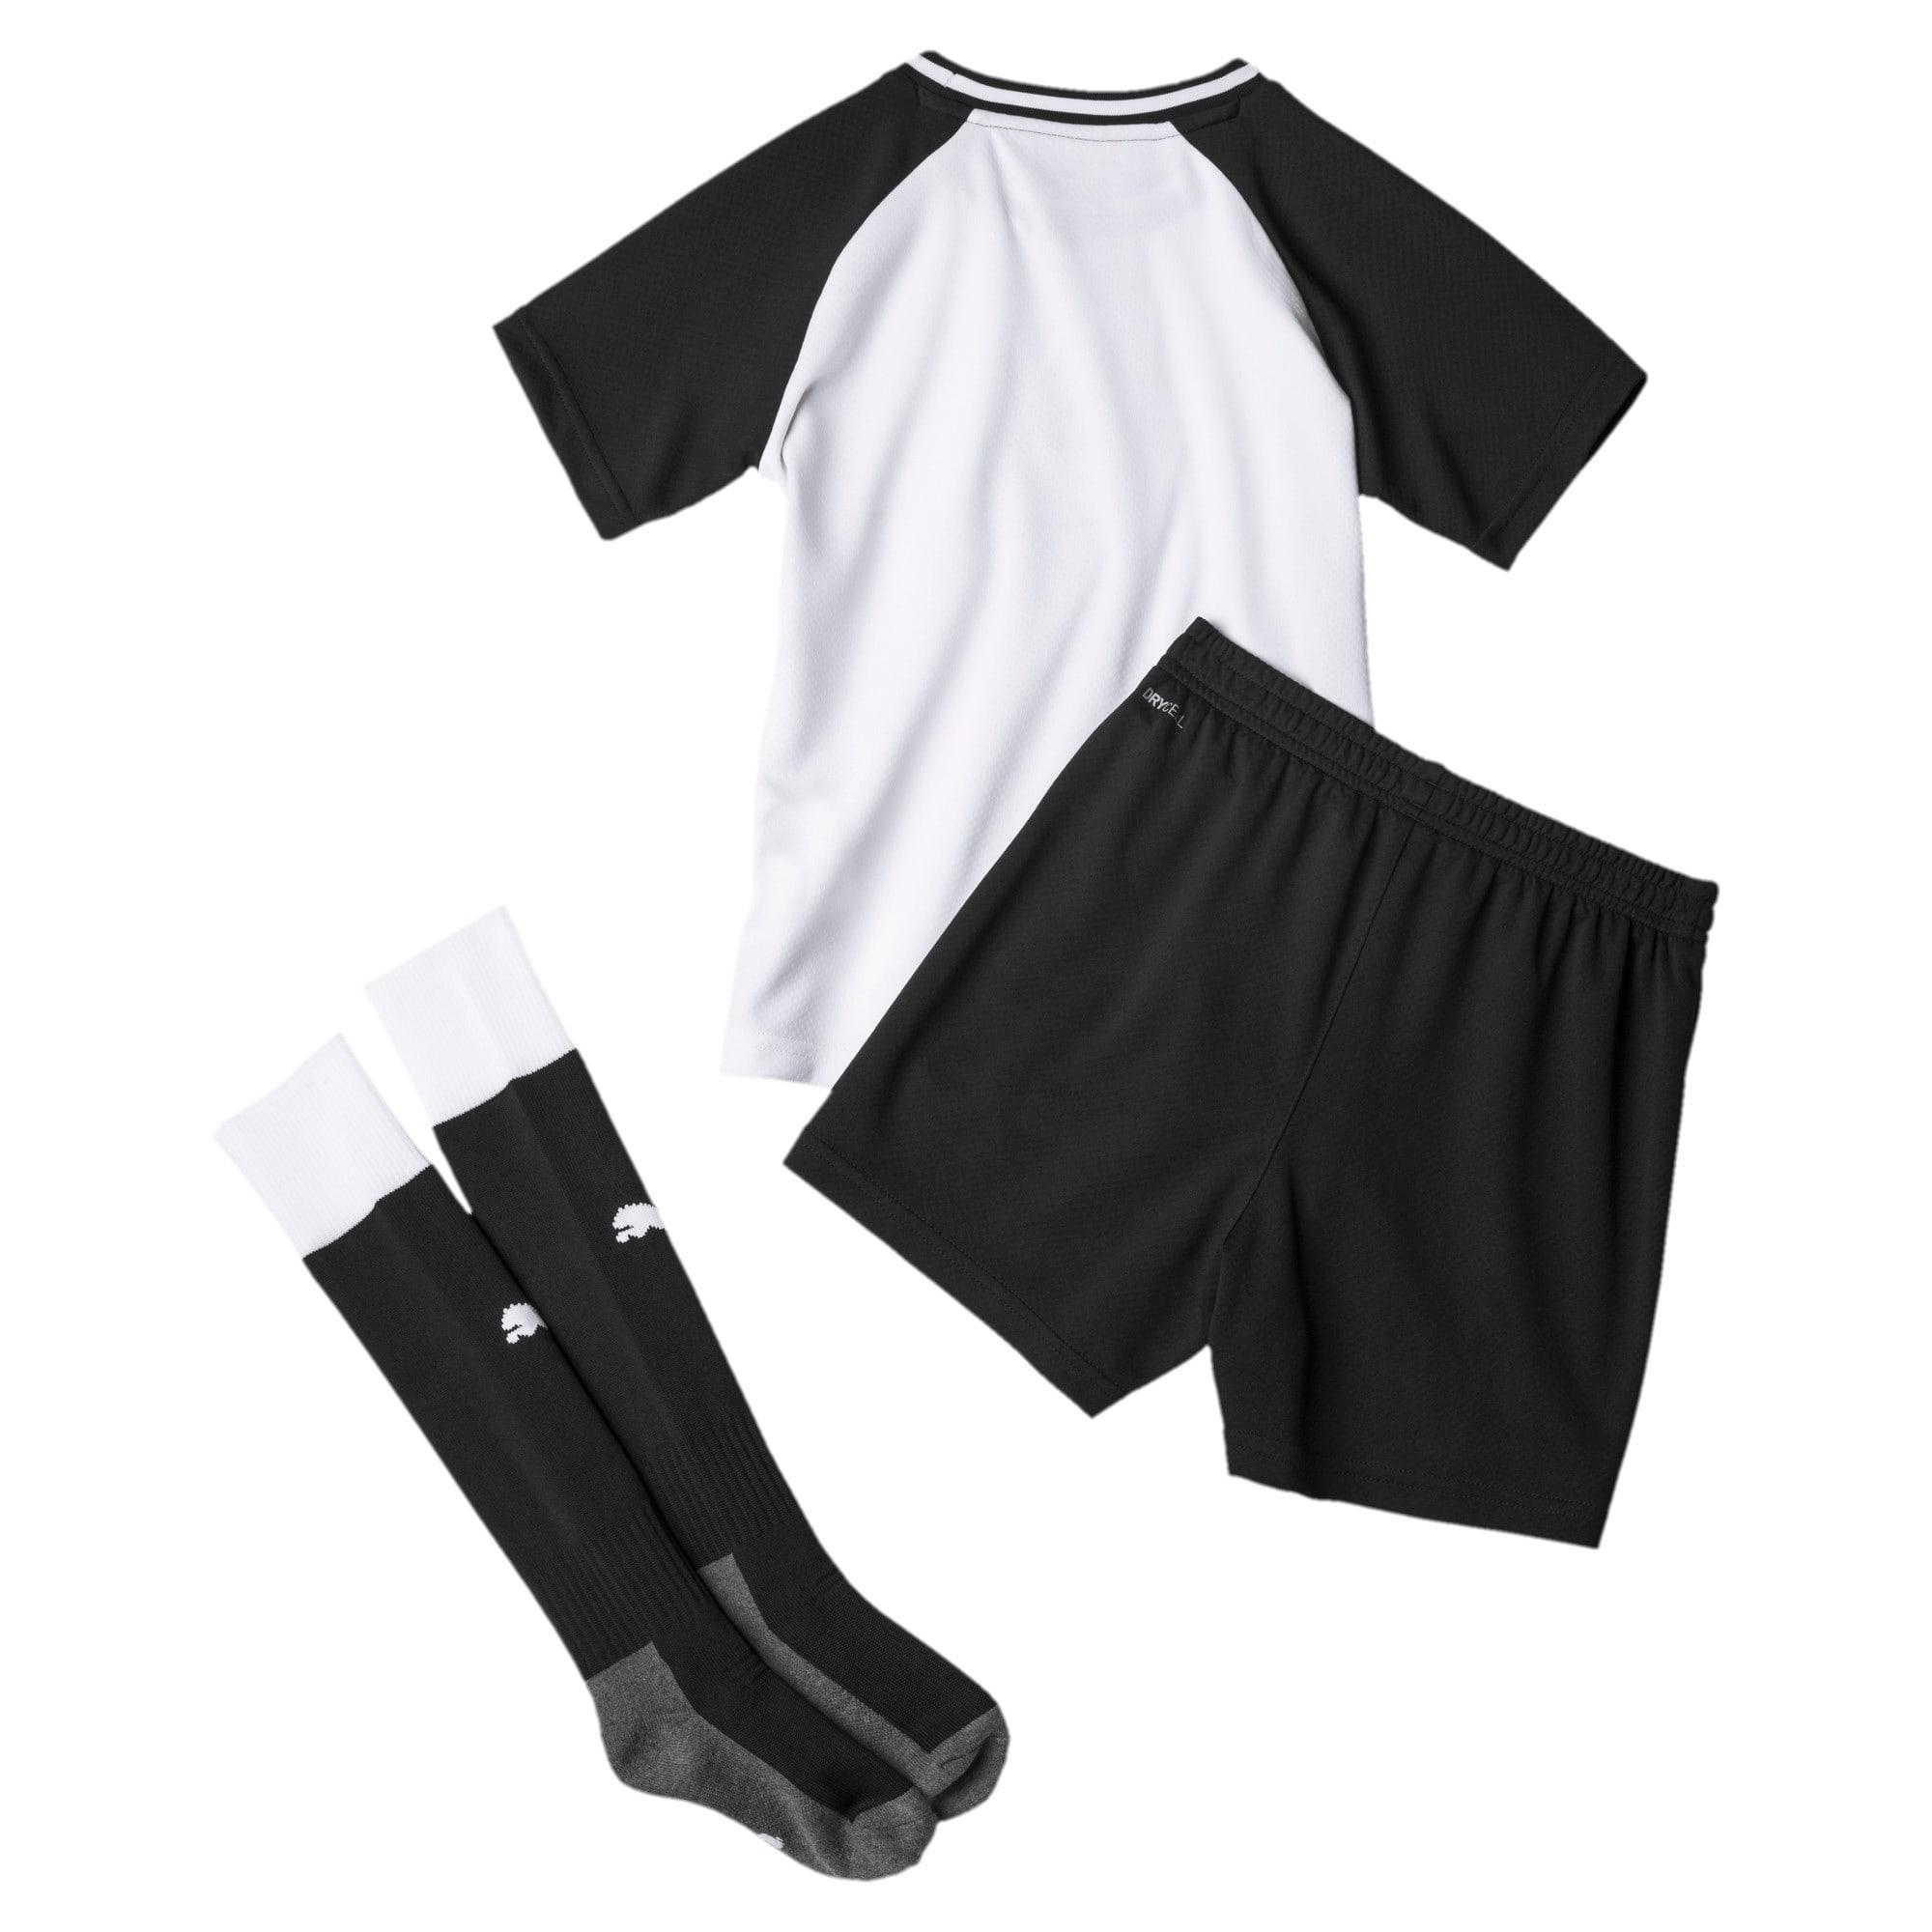 Thumbnail 2 of Newcastle United Kids' Home Mini Kit, Puma White-Puma Black, medium